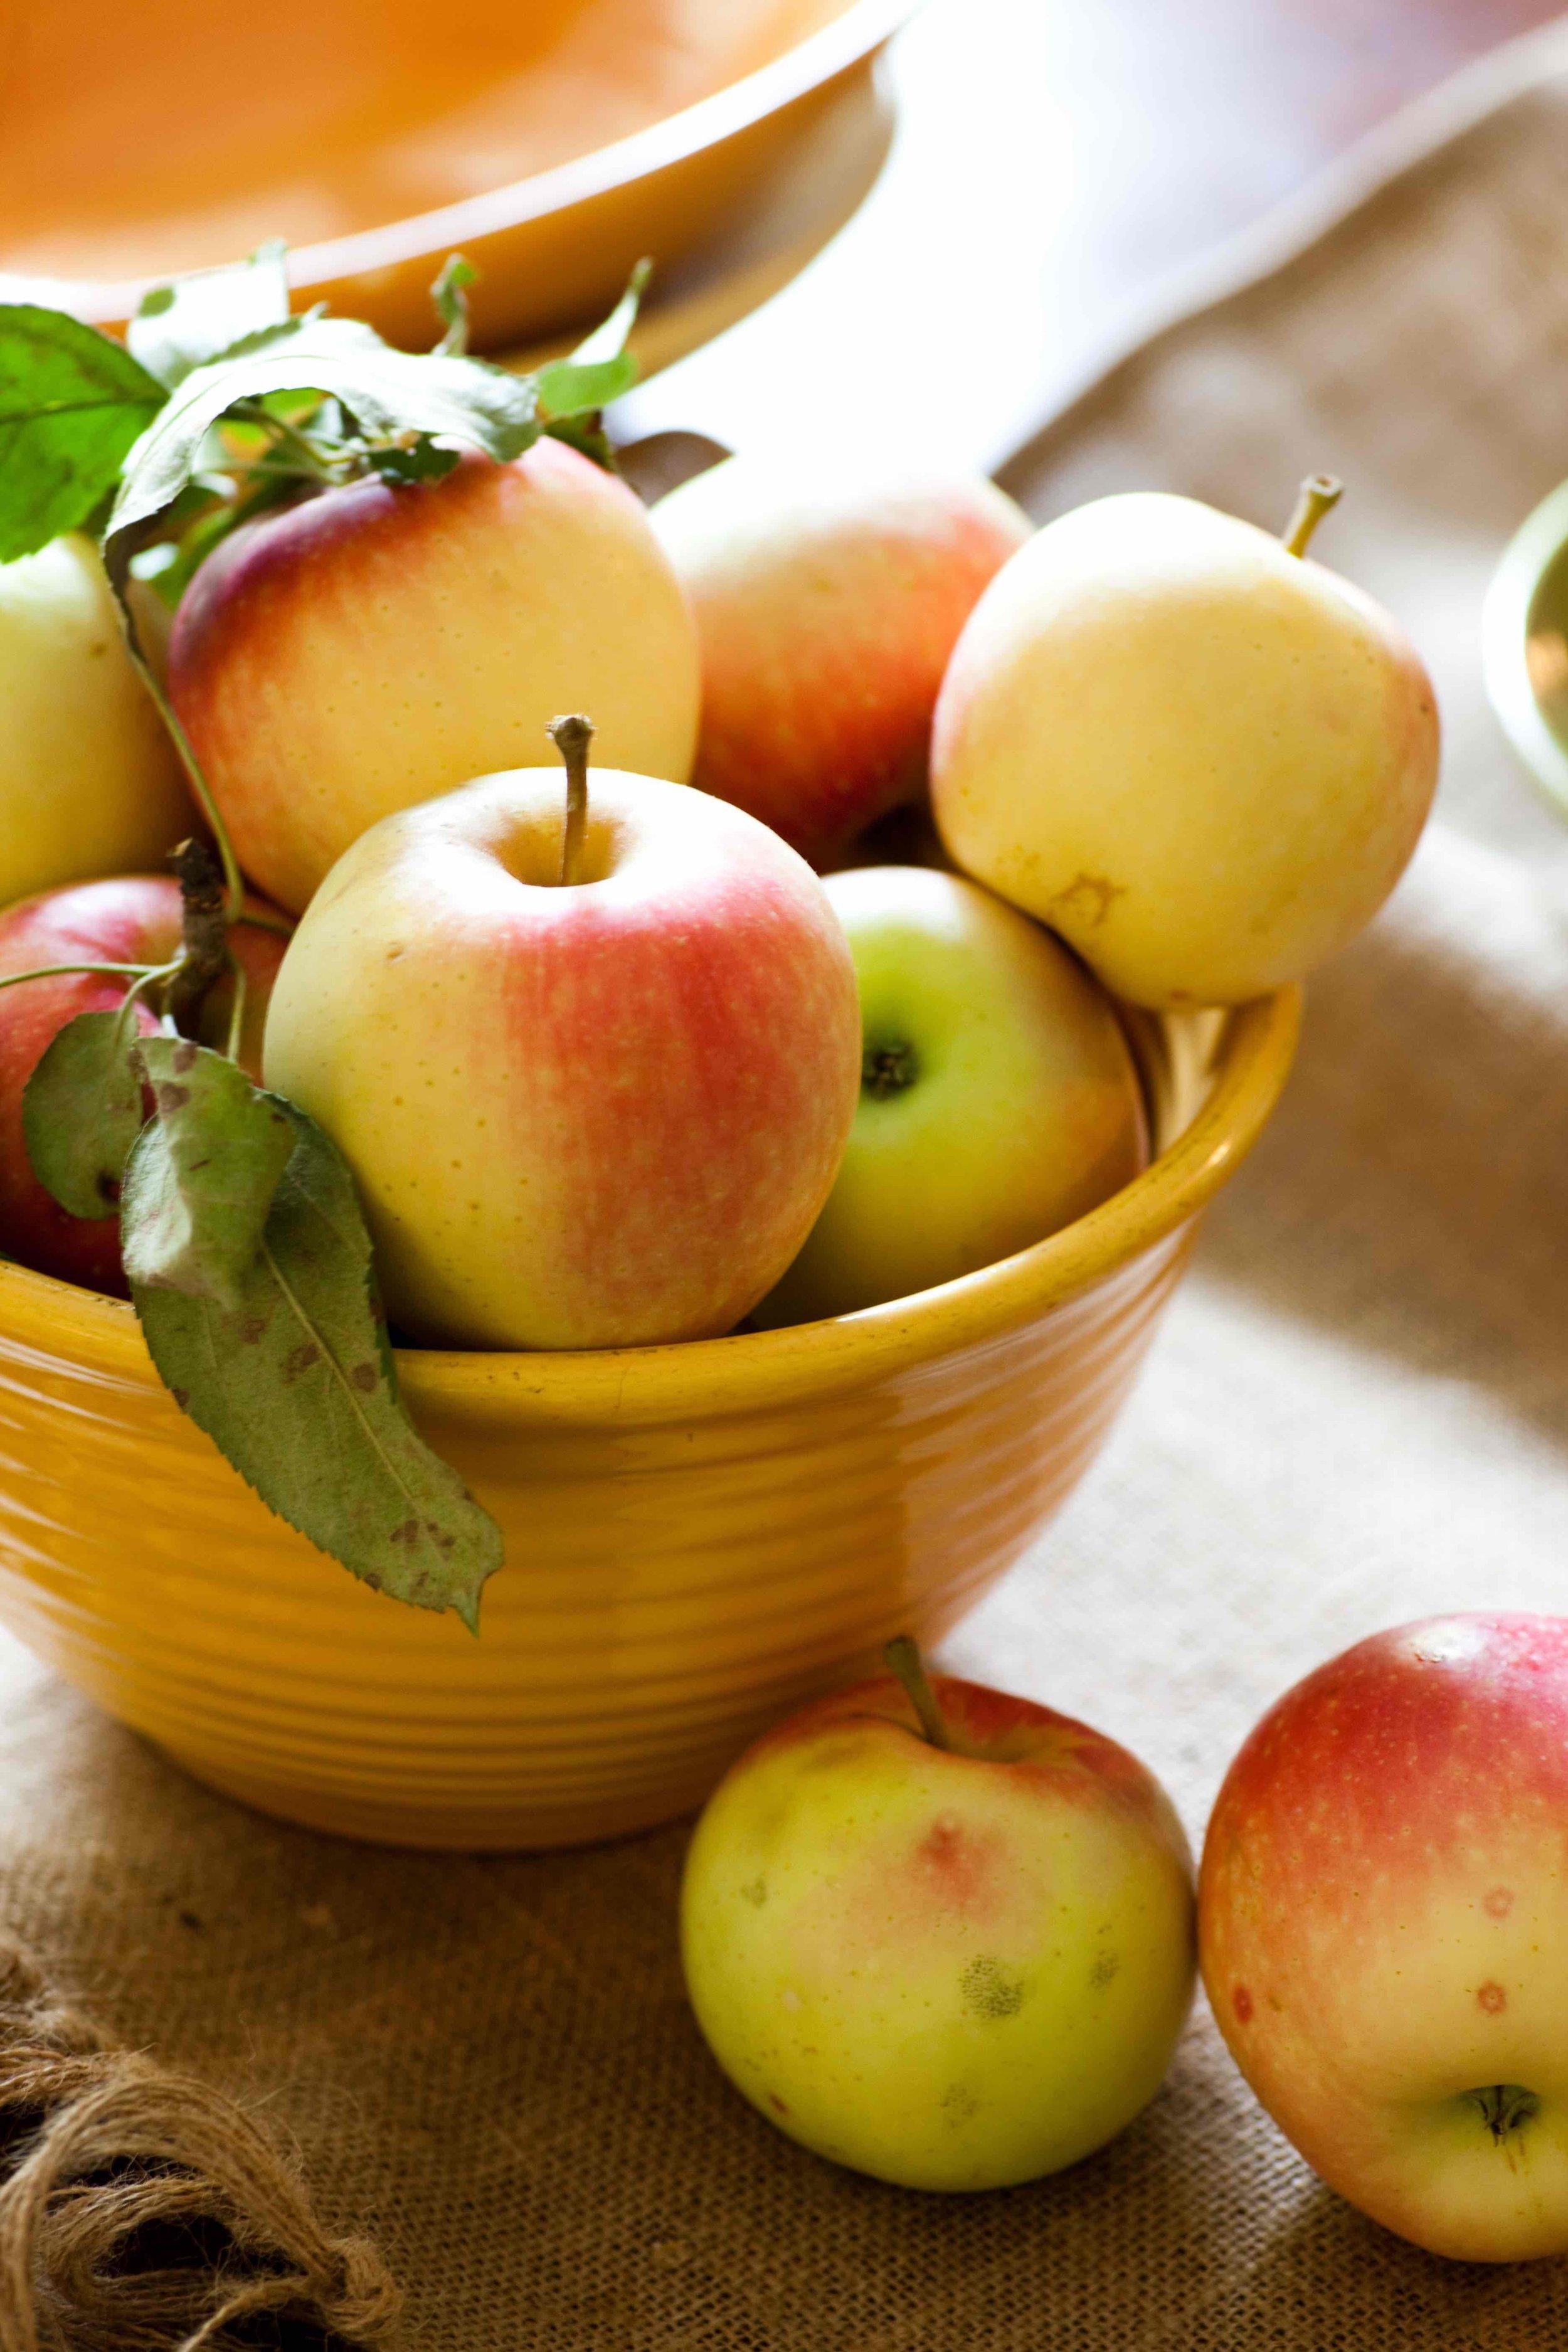 fall apples-sara_shoot3_0339 copy.jpg